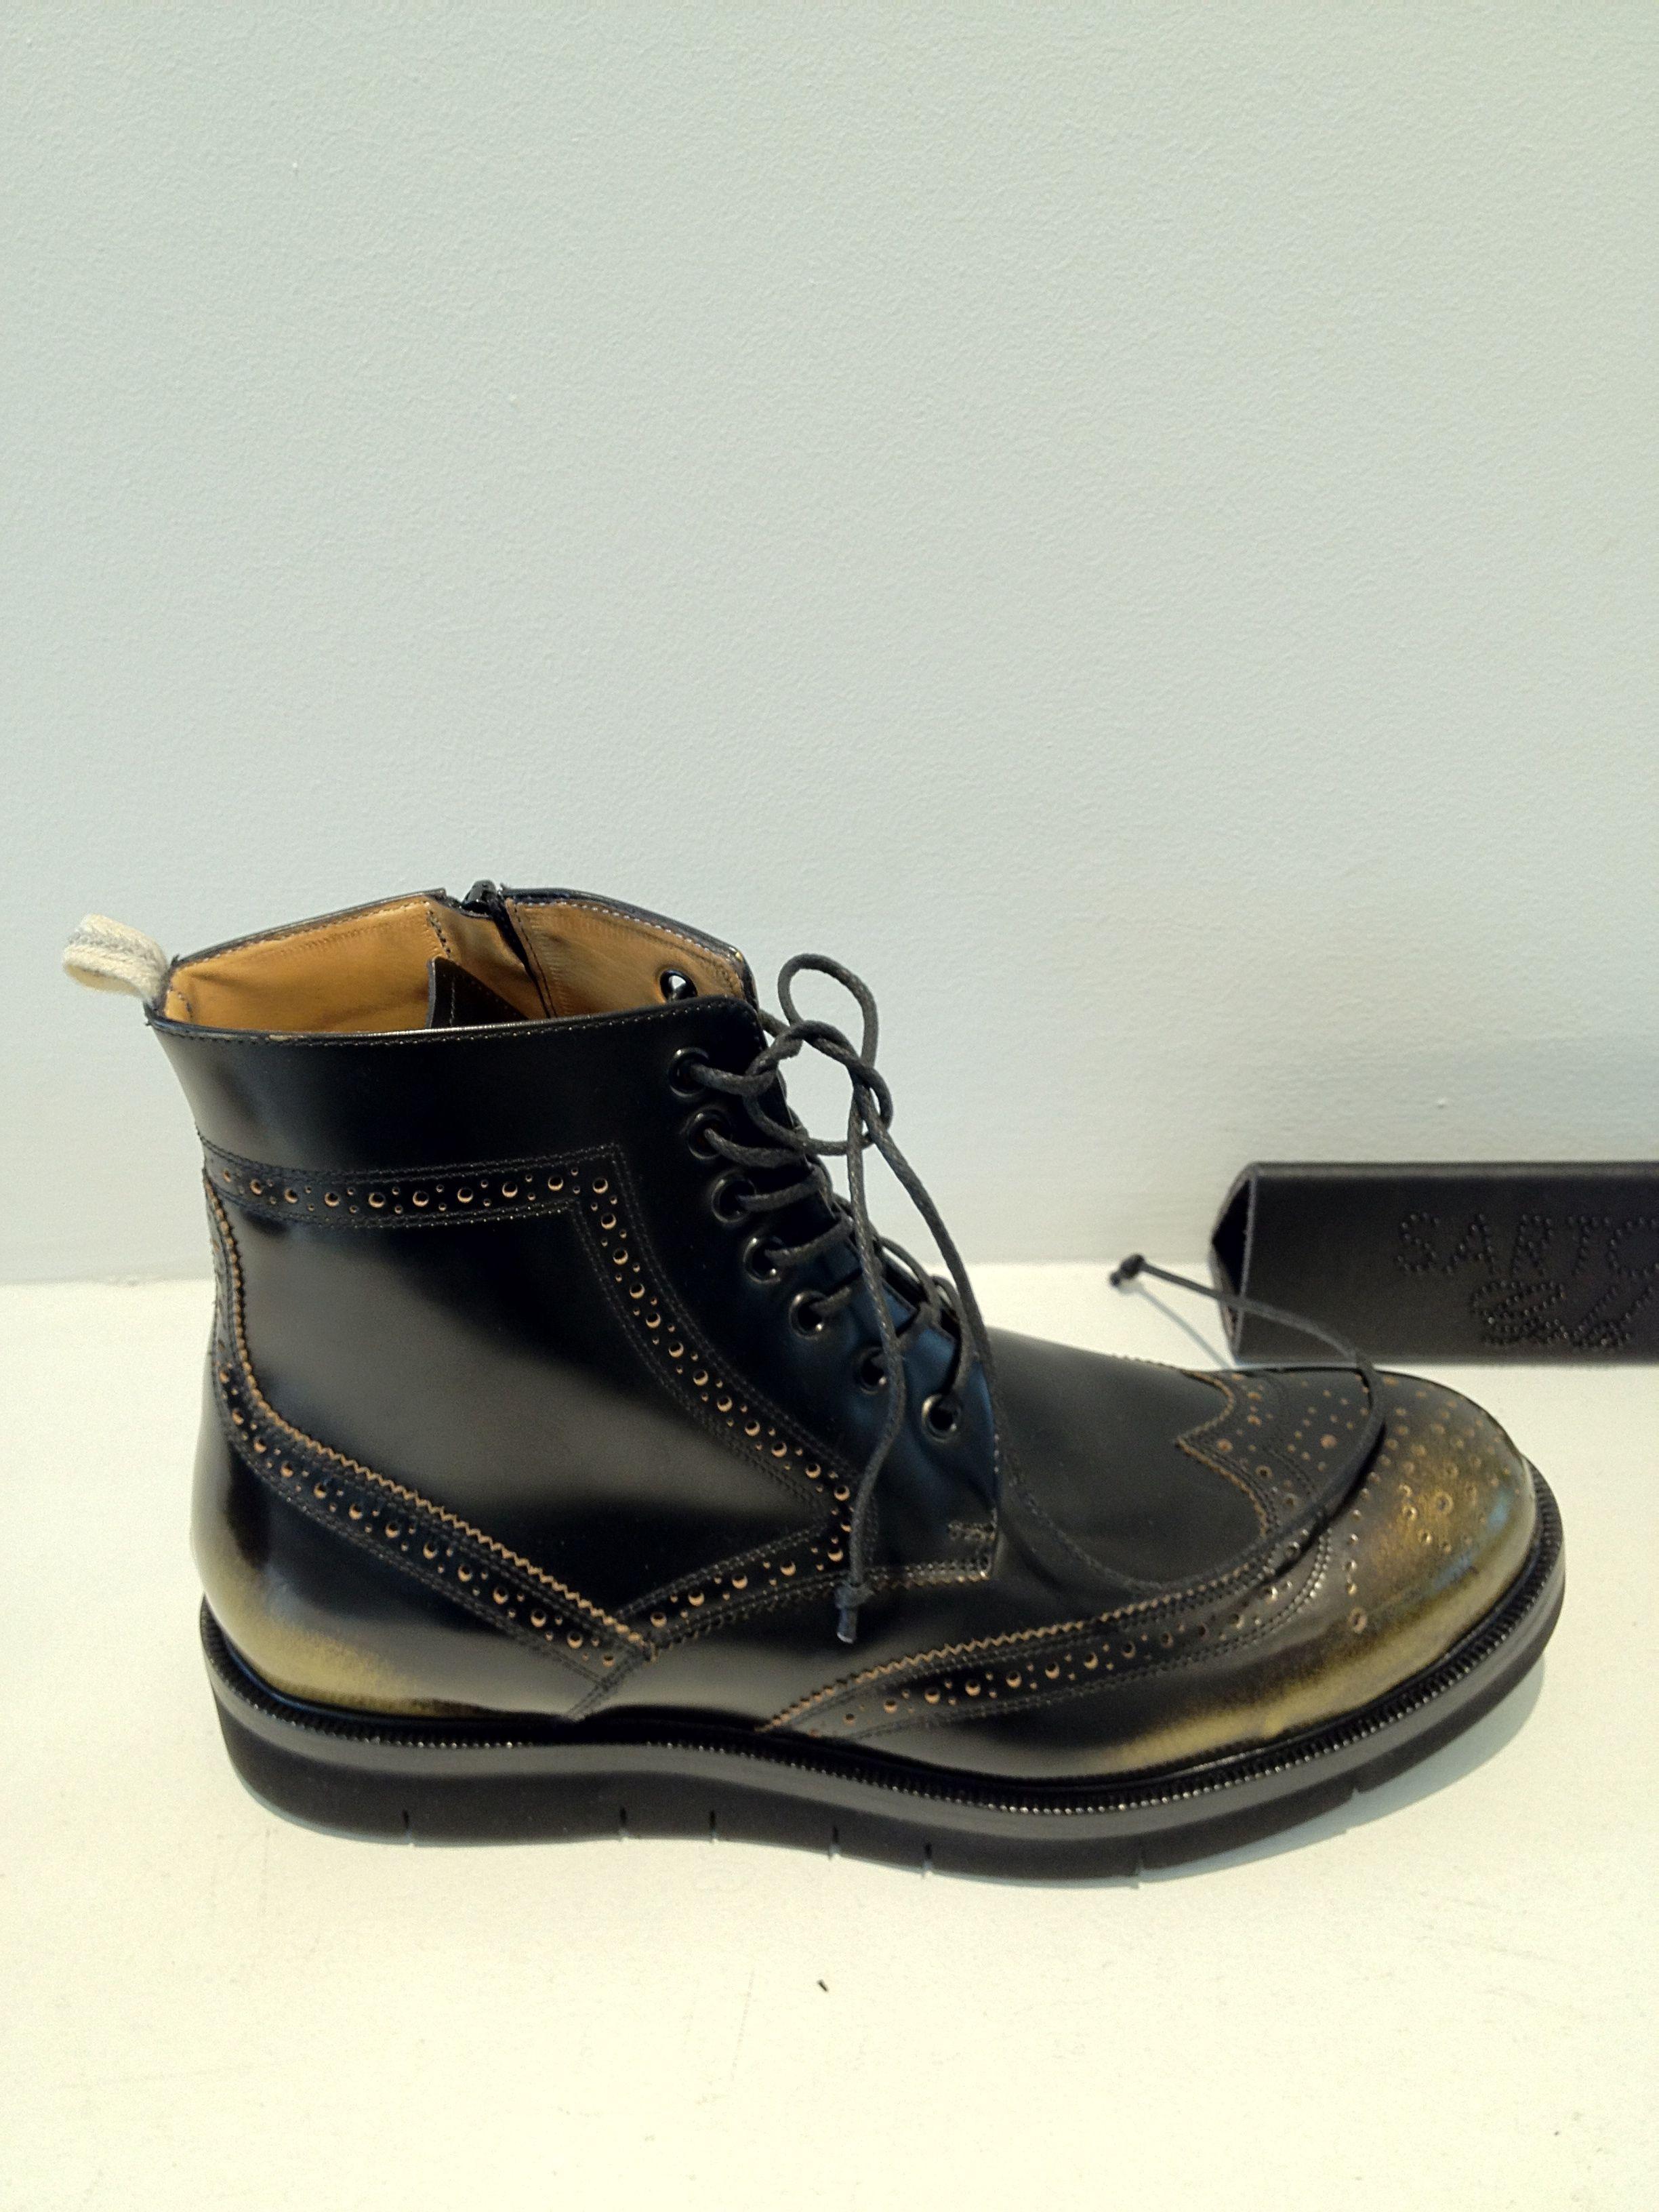 Sartori Gold Man Oxford boot